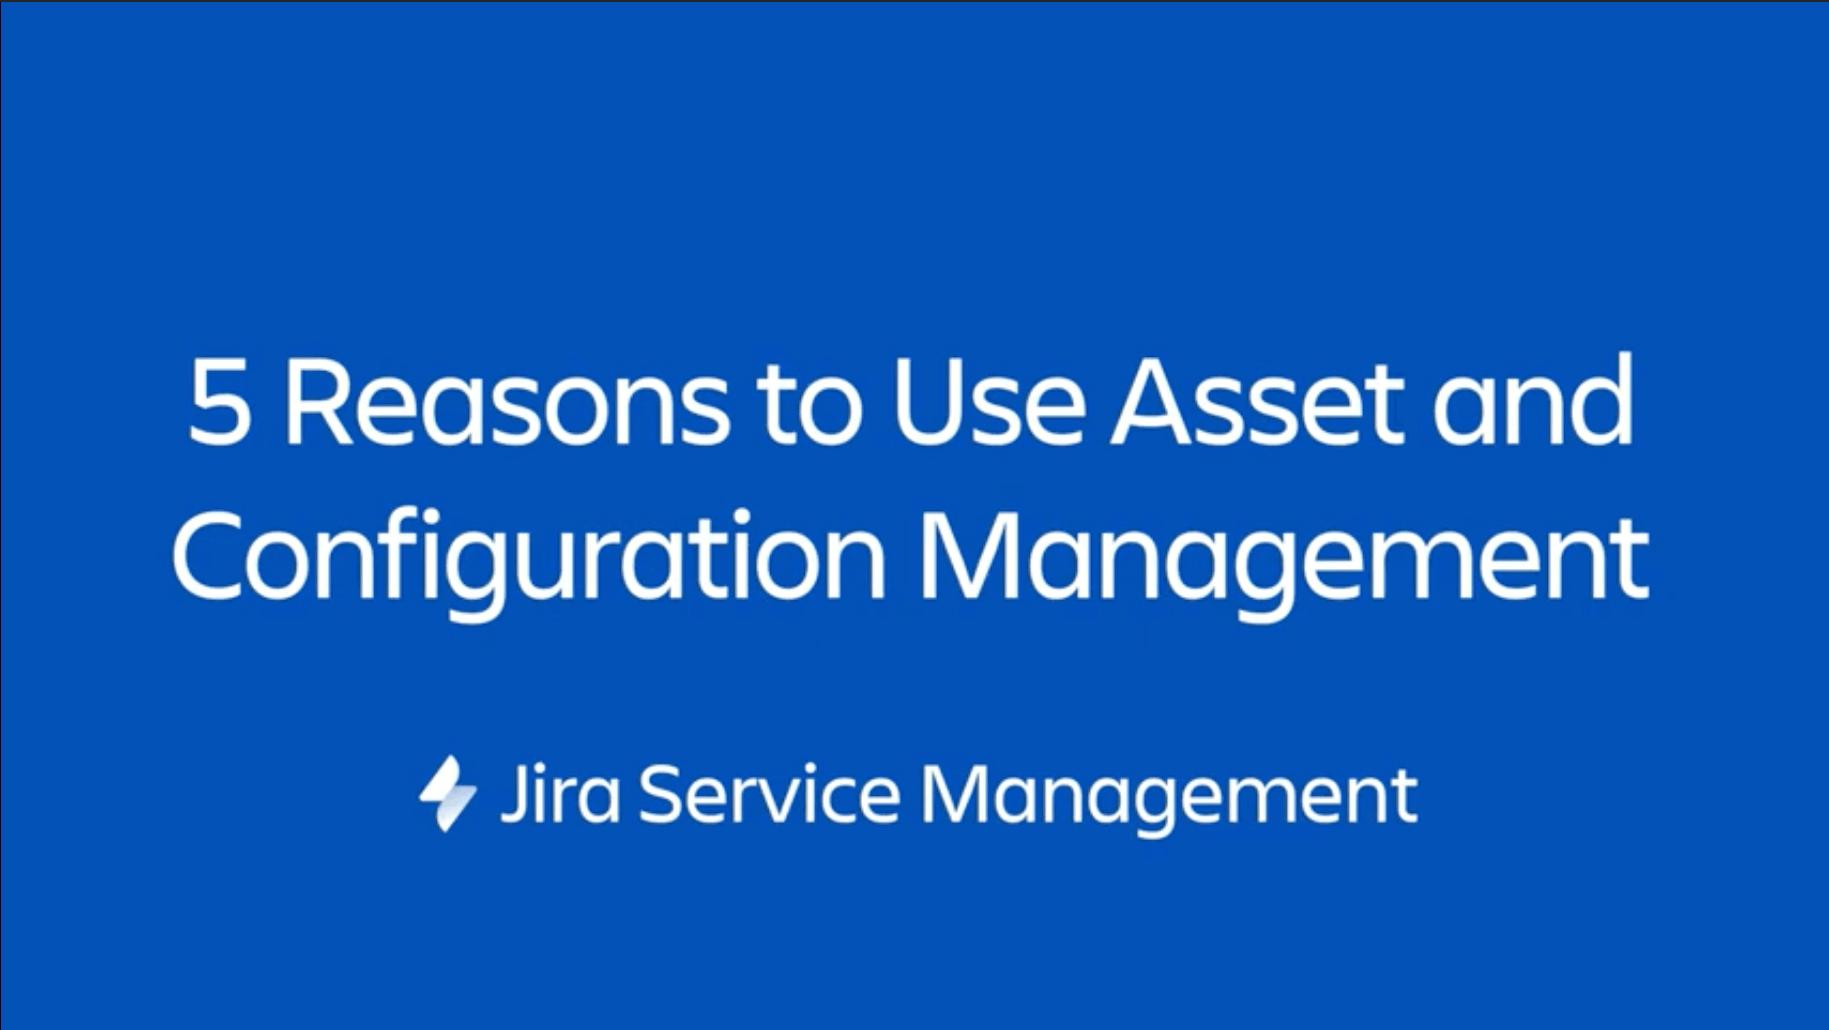 Til Jira Software naar een hoger niveau met Jira Service Management